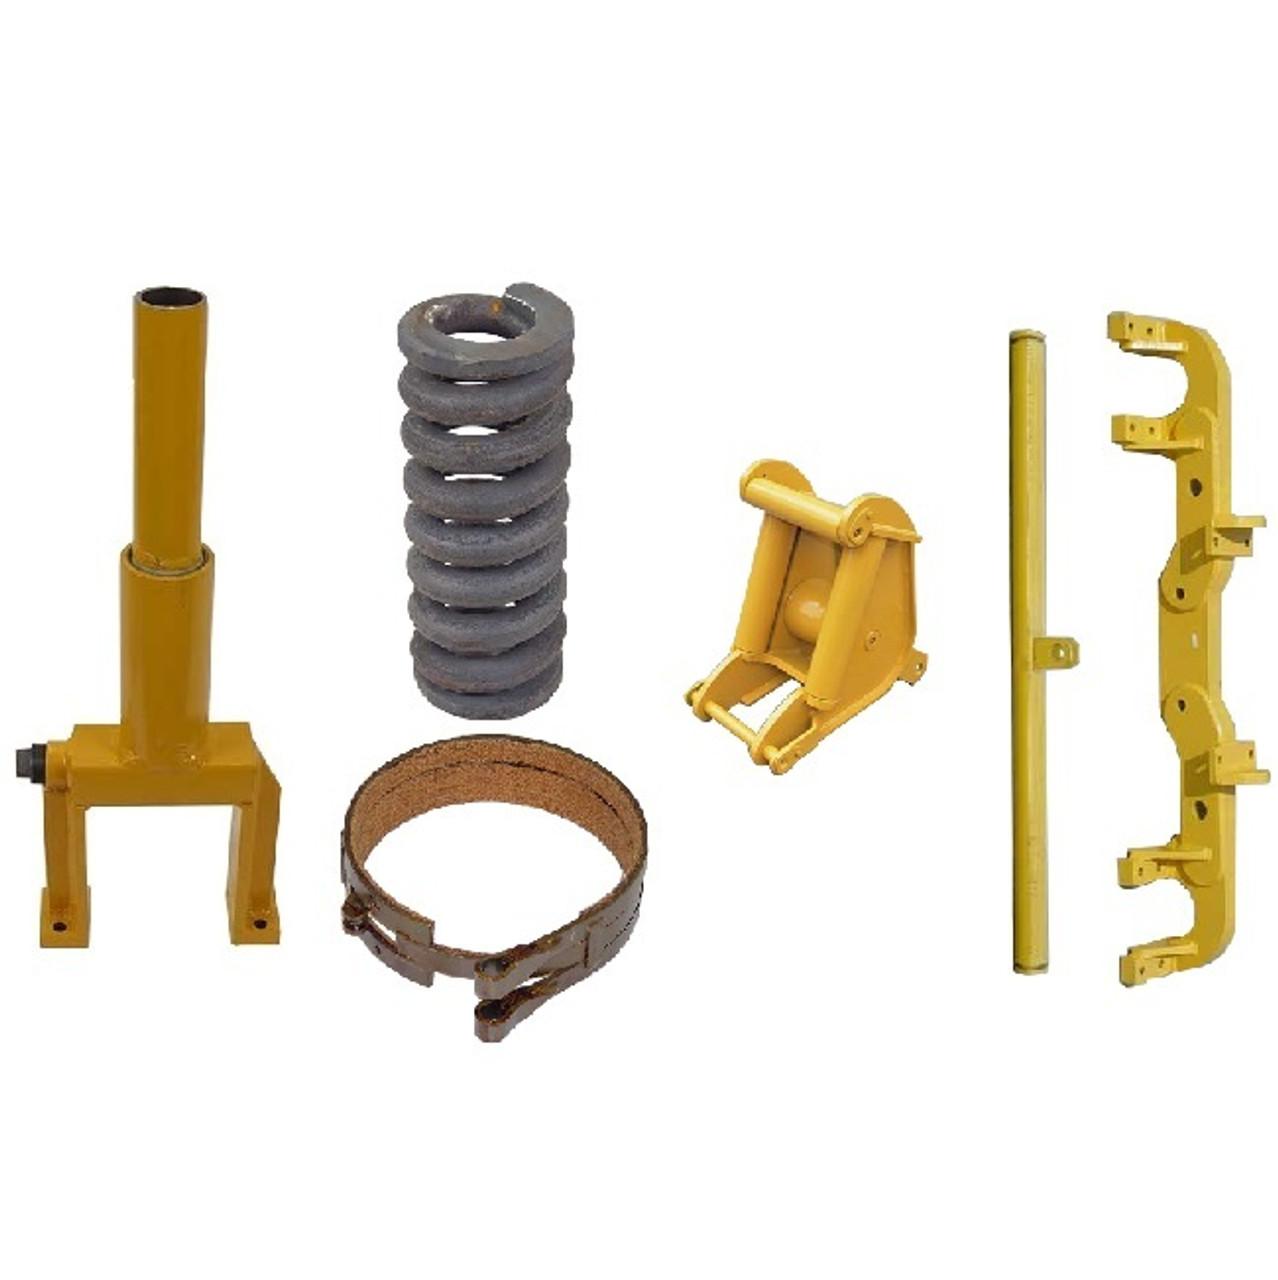 John Deere Dozer & After Market Parts | Deere Parts at